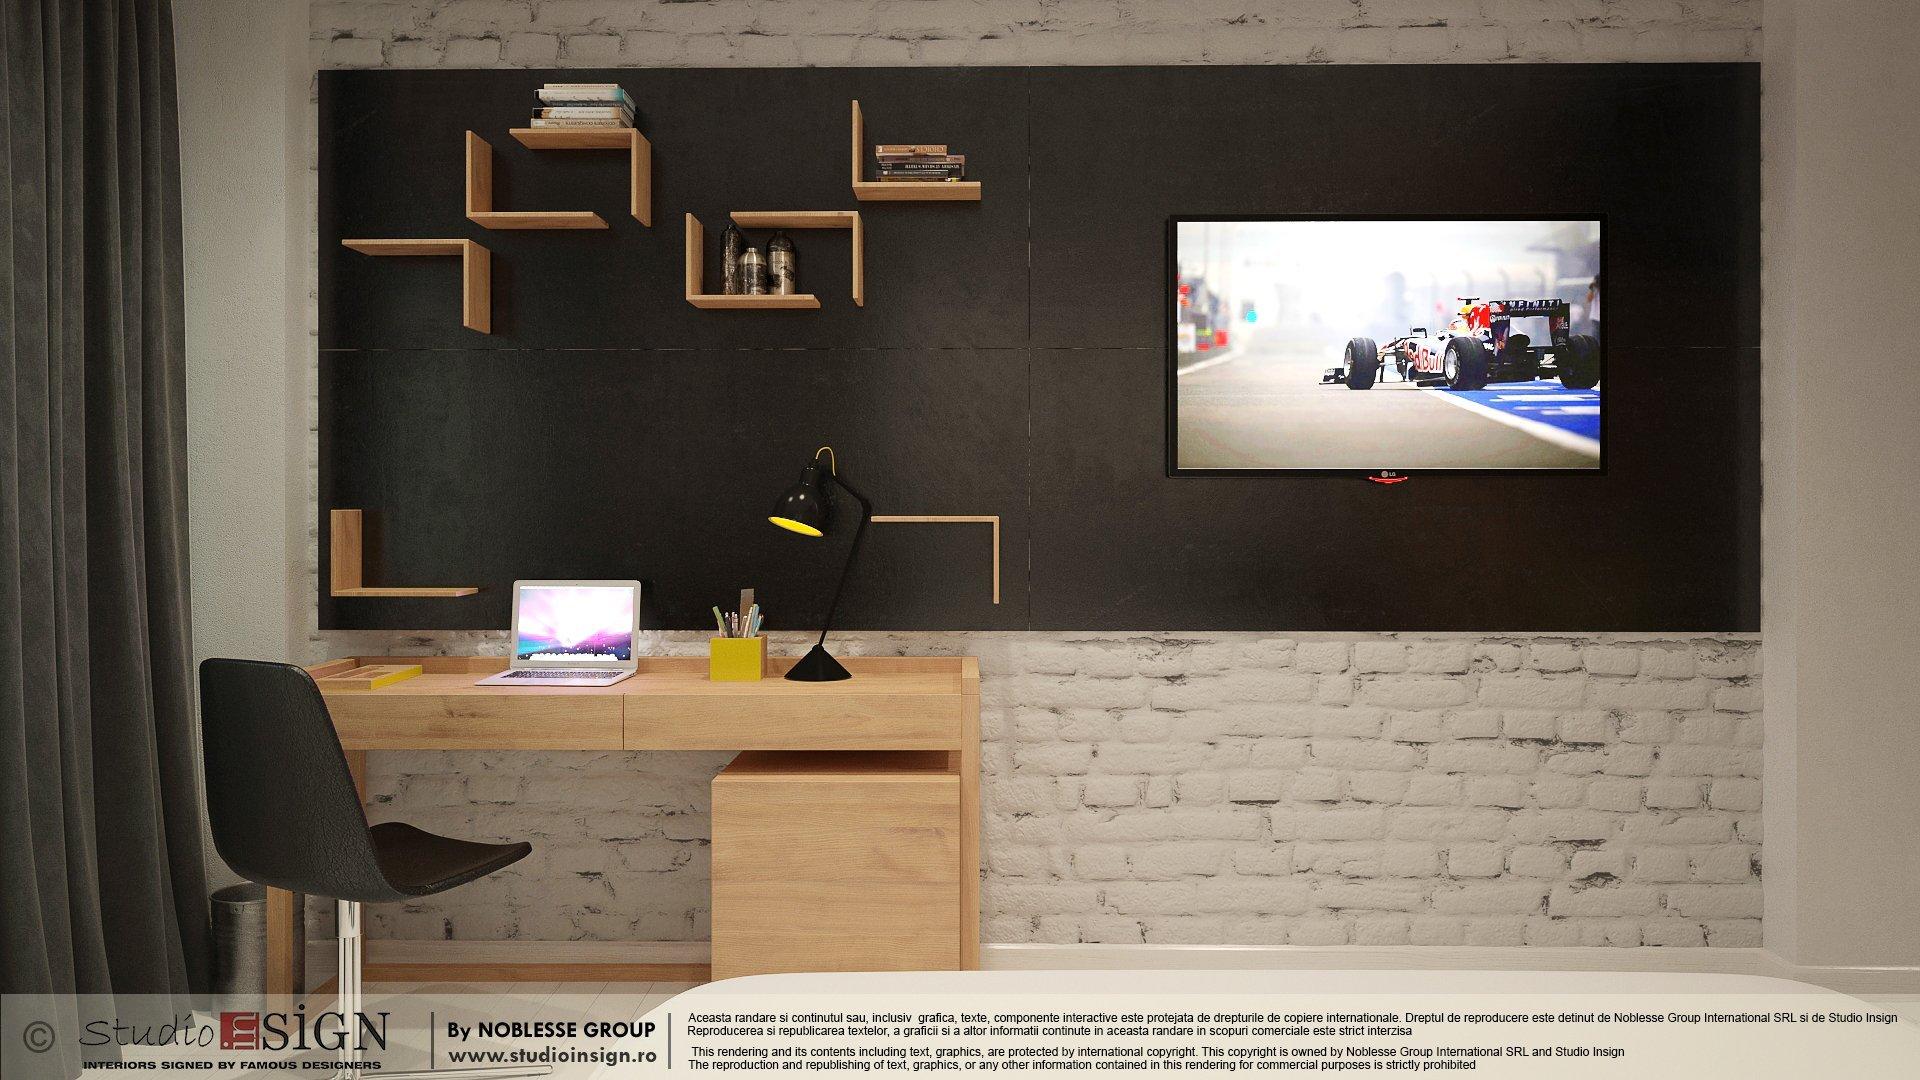 Proiect amenajare camera hotel in stil loft industrial newyorkez-seara-4